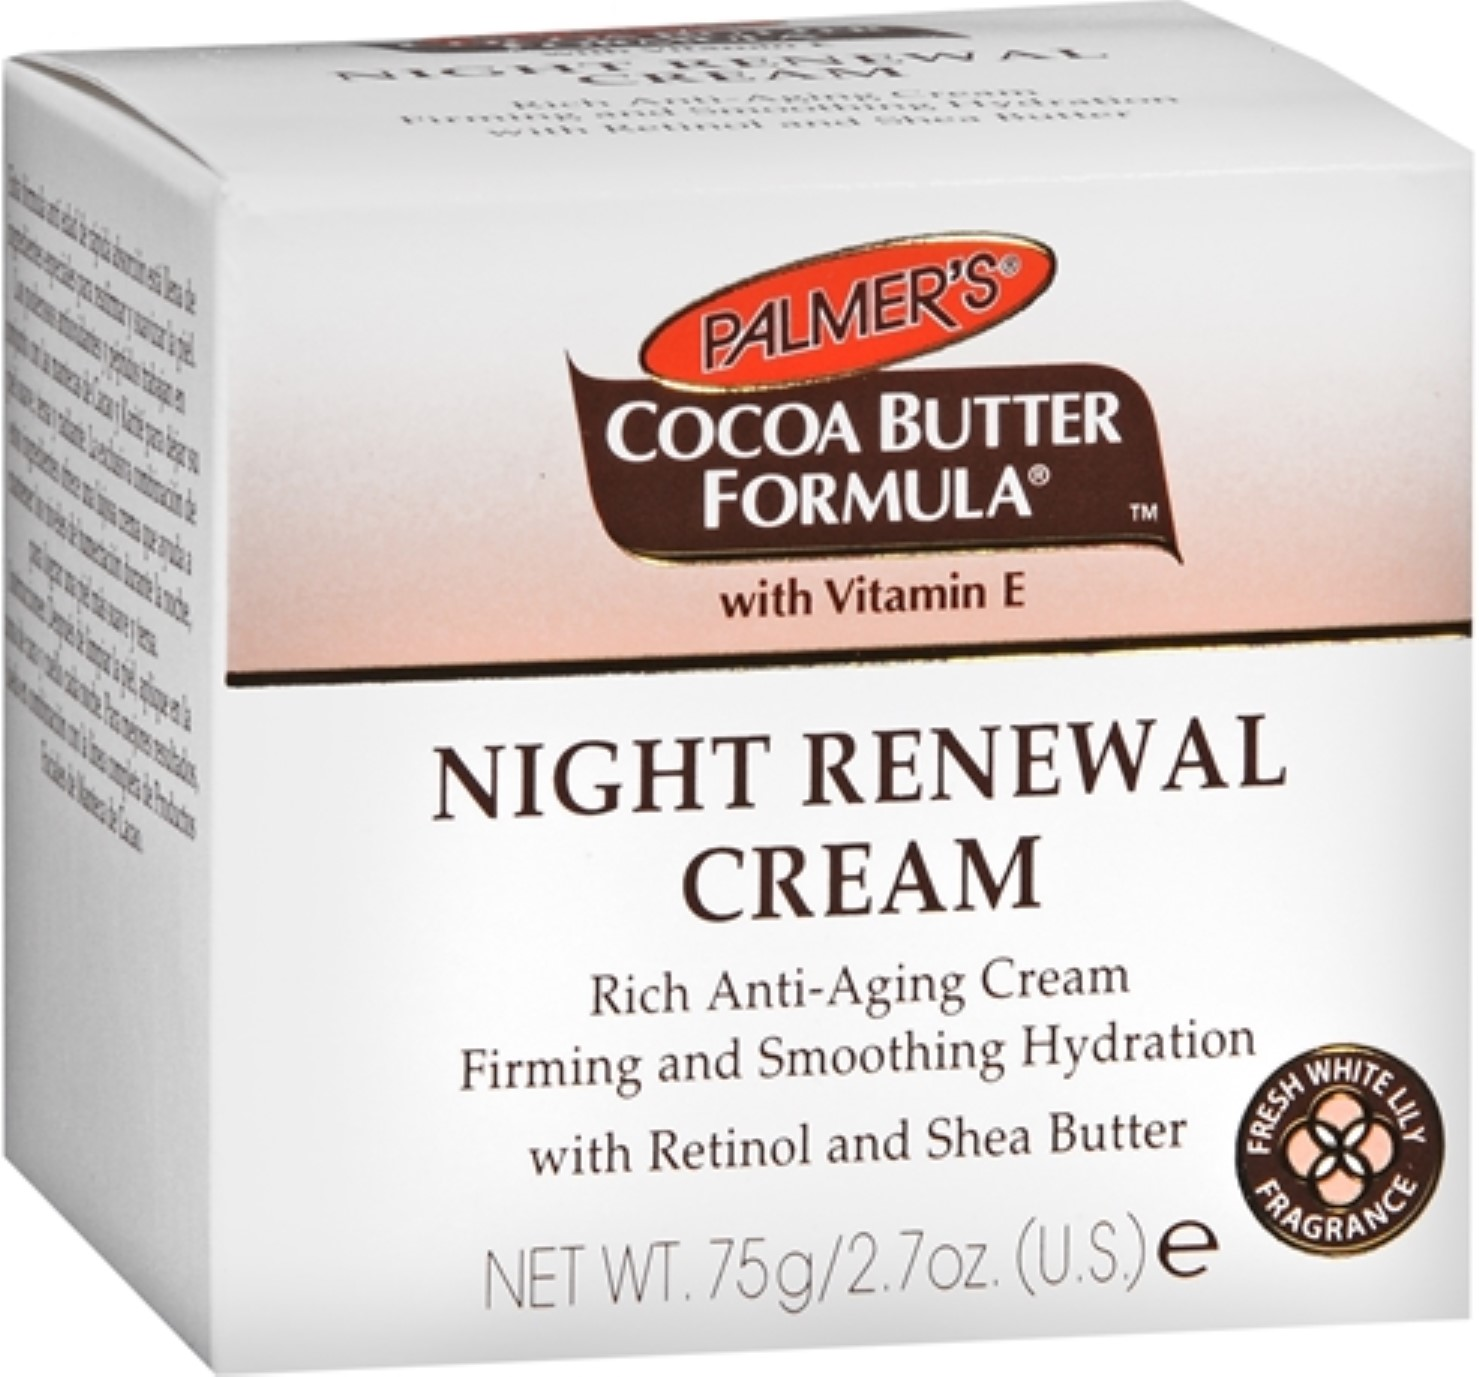 Palmer's Cocoa Butter Formula Fresh White Lily Night Renewal Cream, 2.7 oz